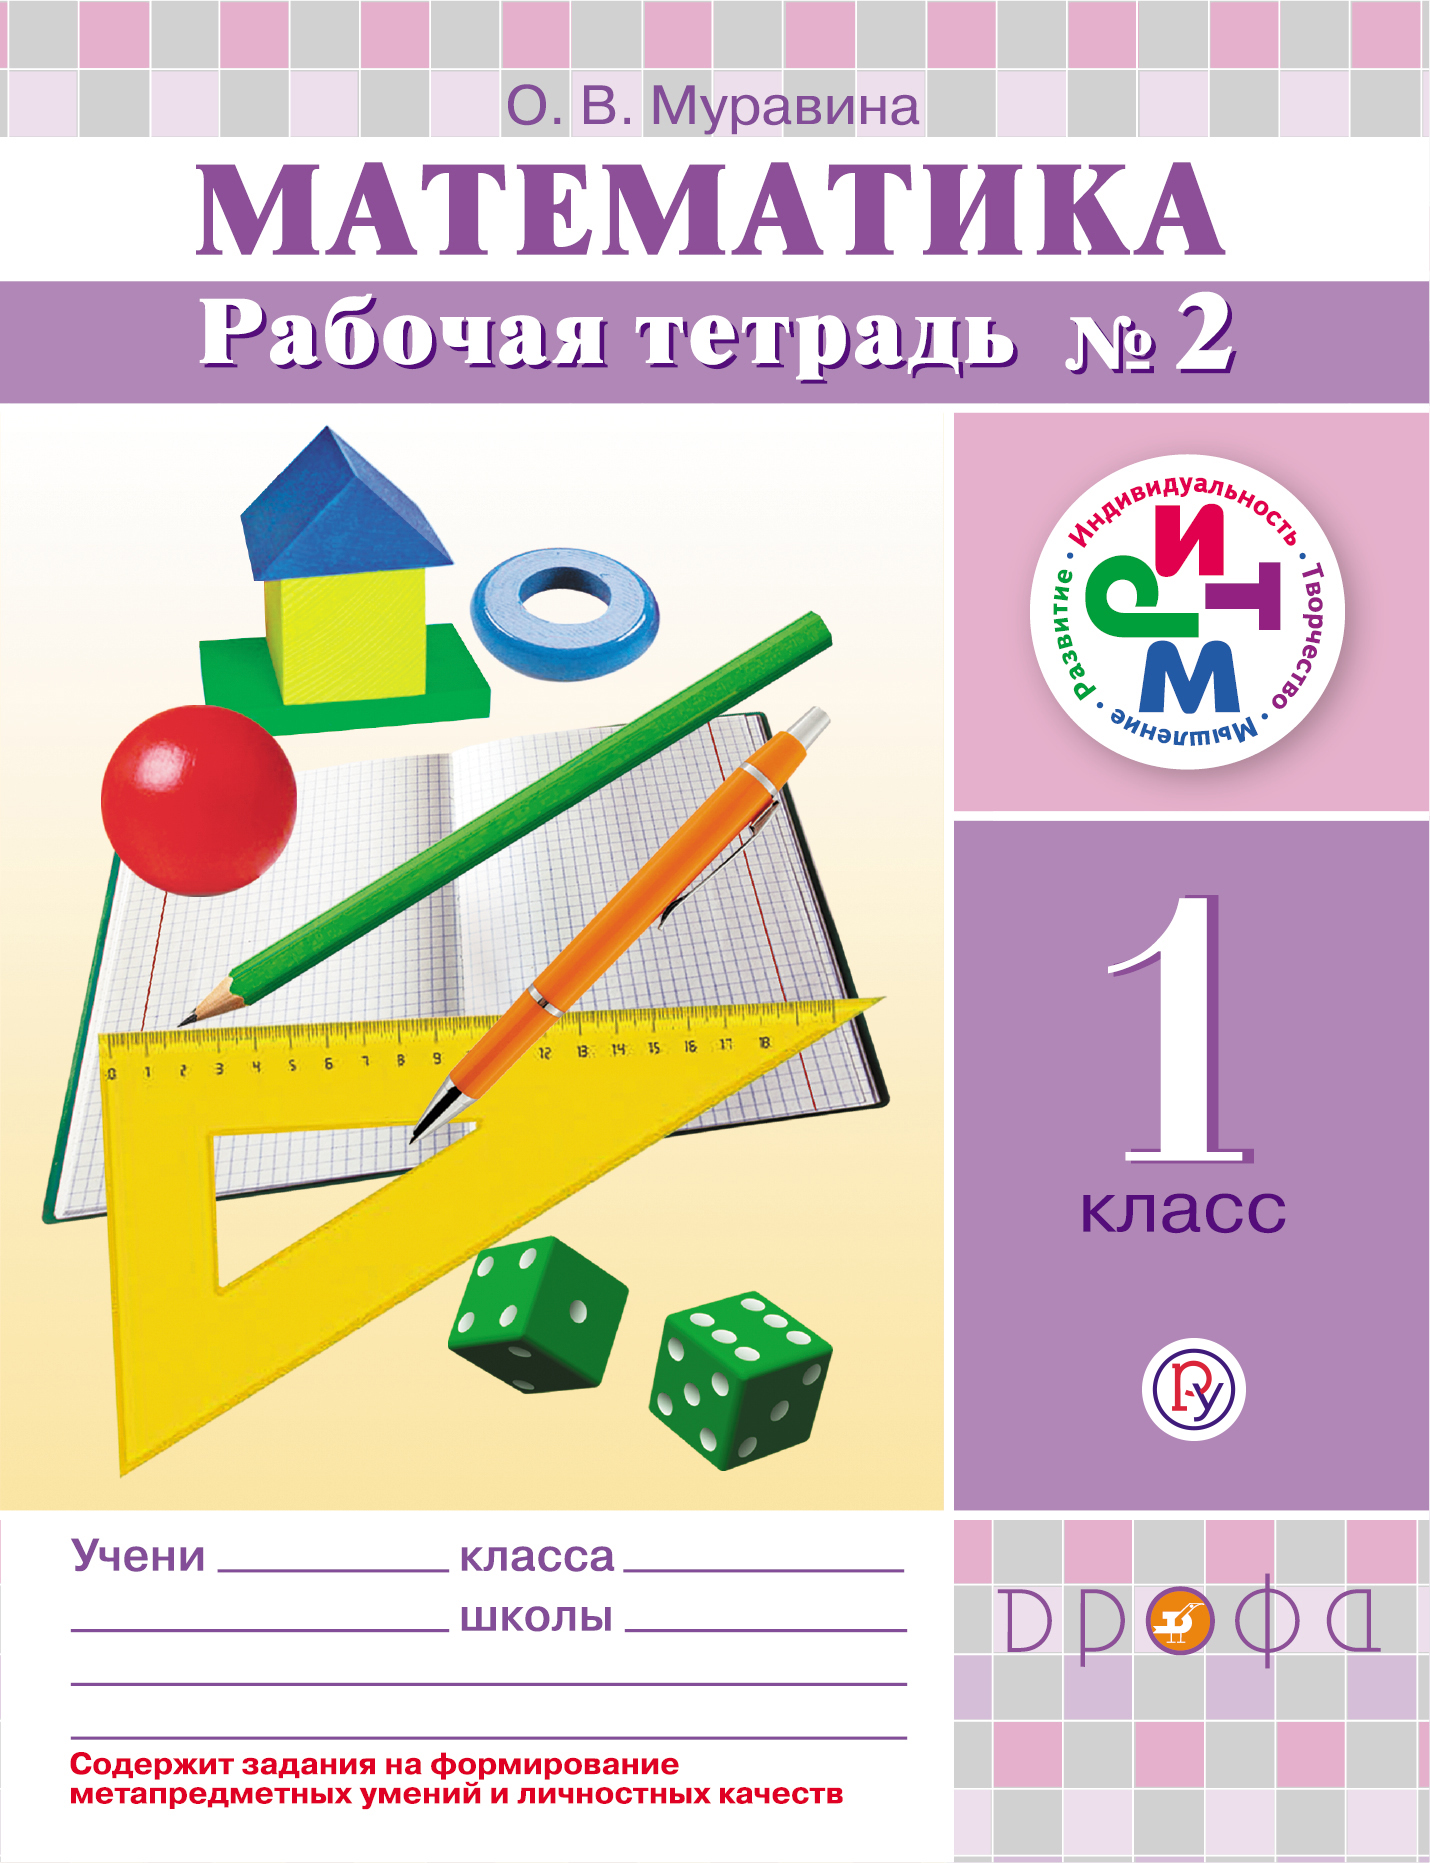 Муравина О.В. Математика. 1 класс. Рабочая тетрадь №2